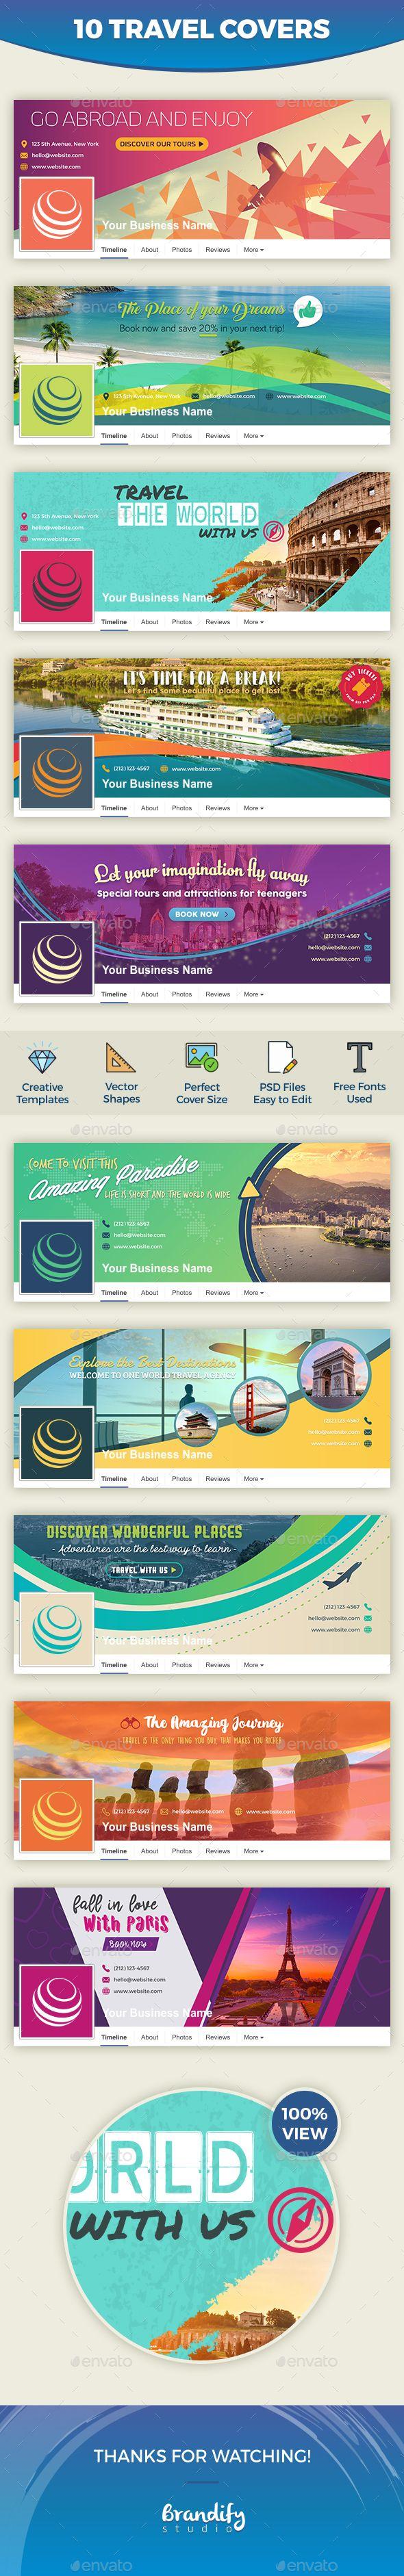 Ux solutions digital art director and motion designer based in noosa - Travel Facebook Cover